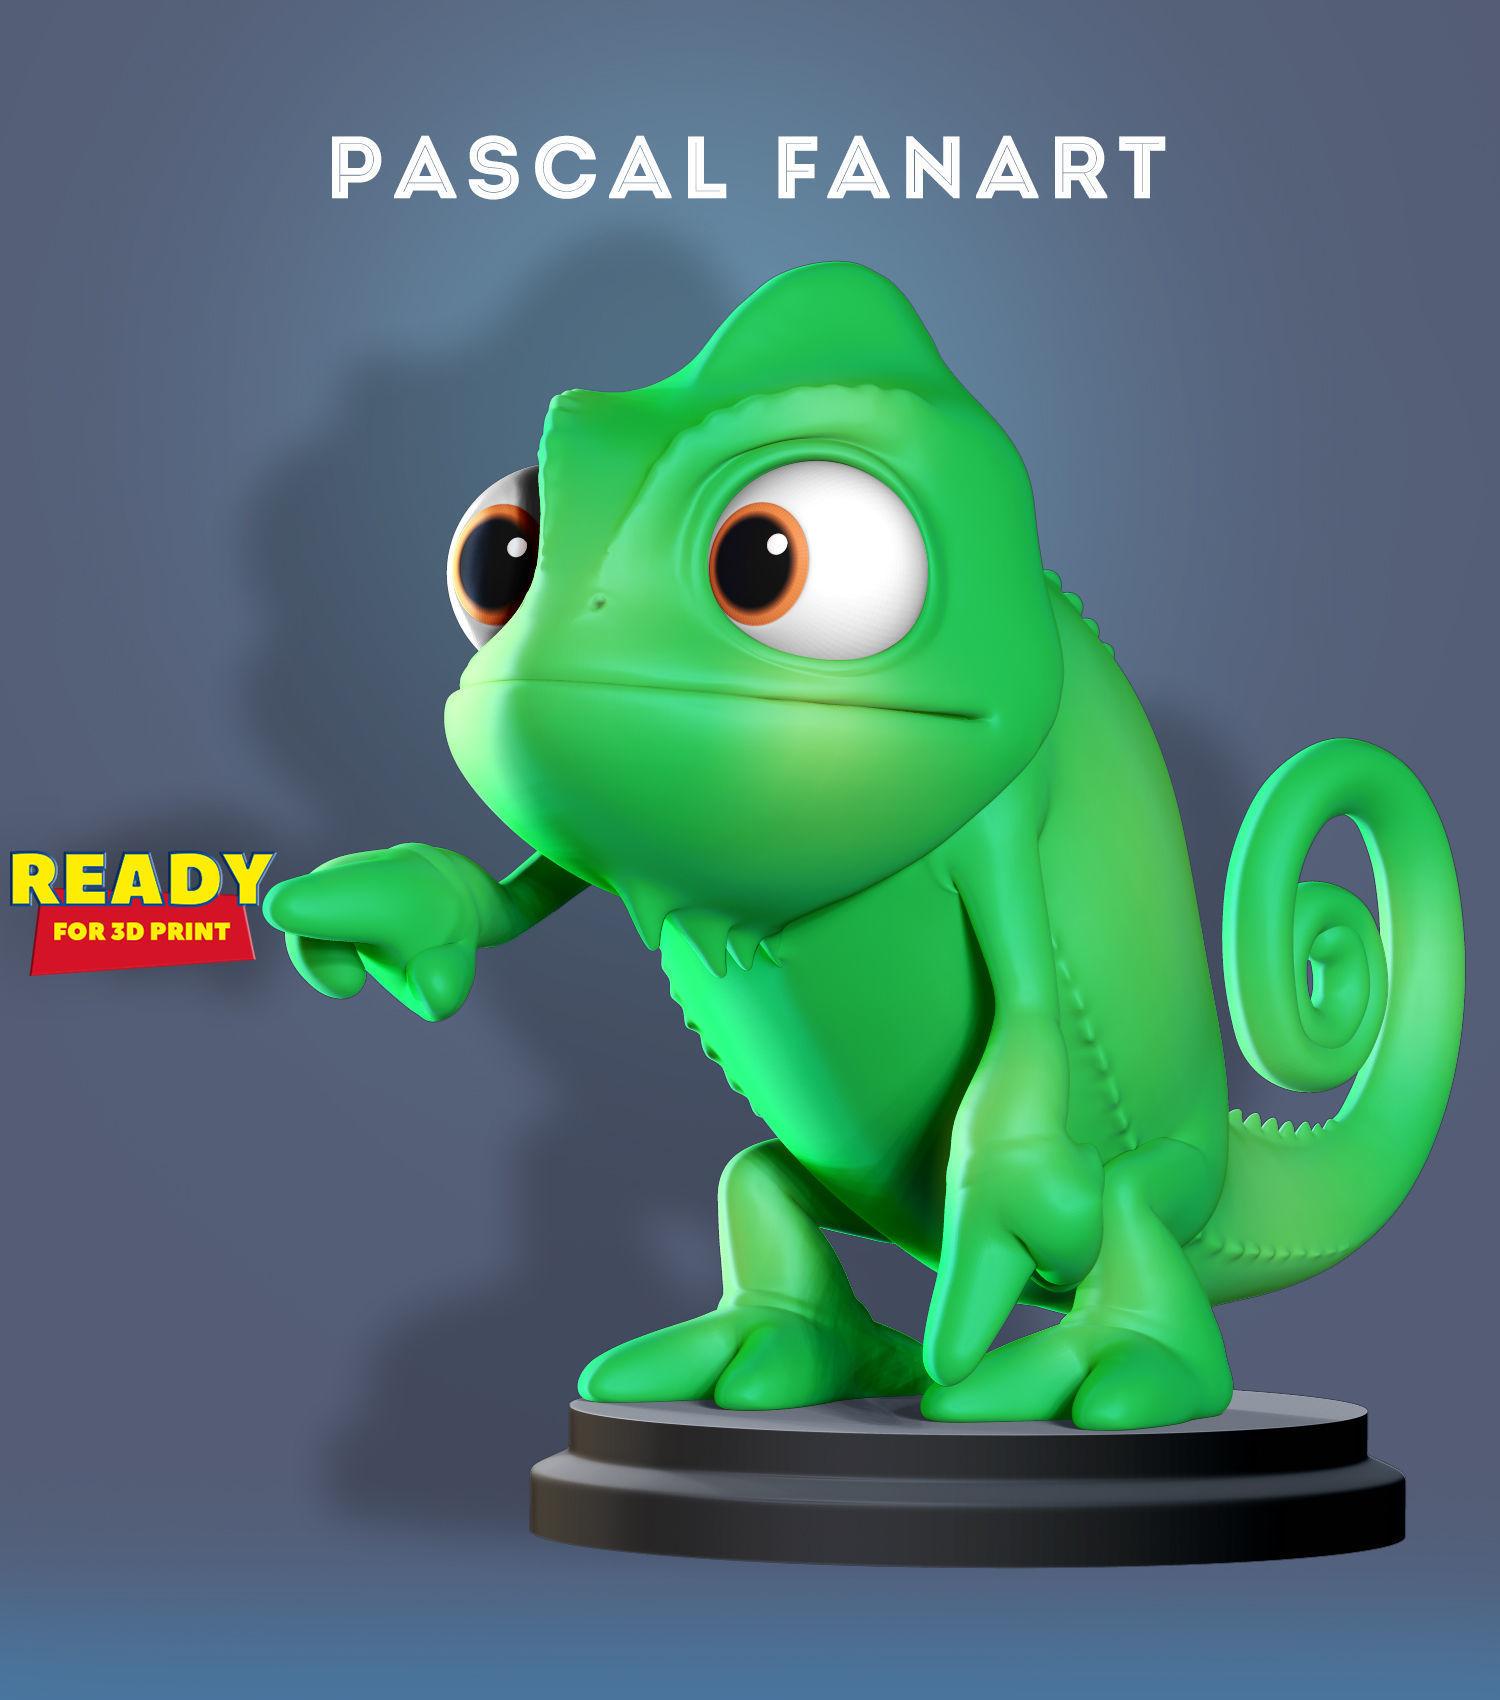 Pascal Fanart 3d Print Model